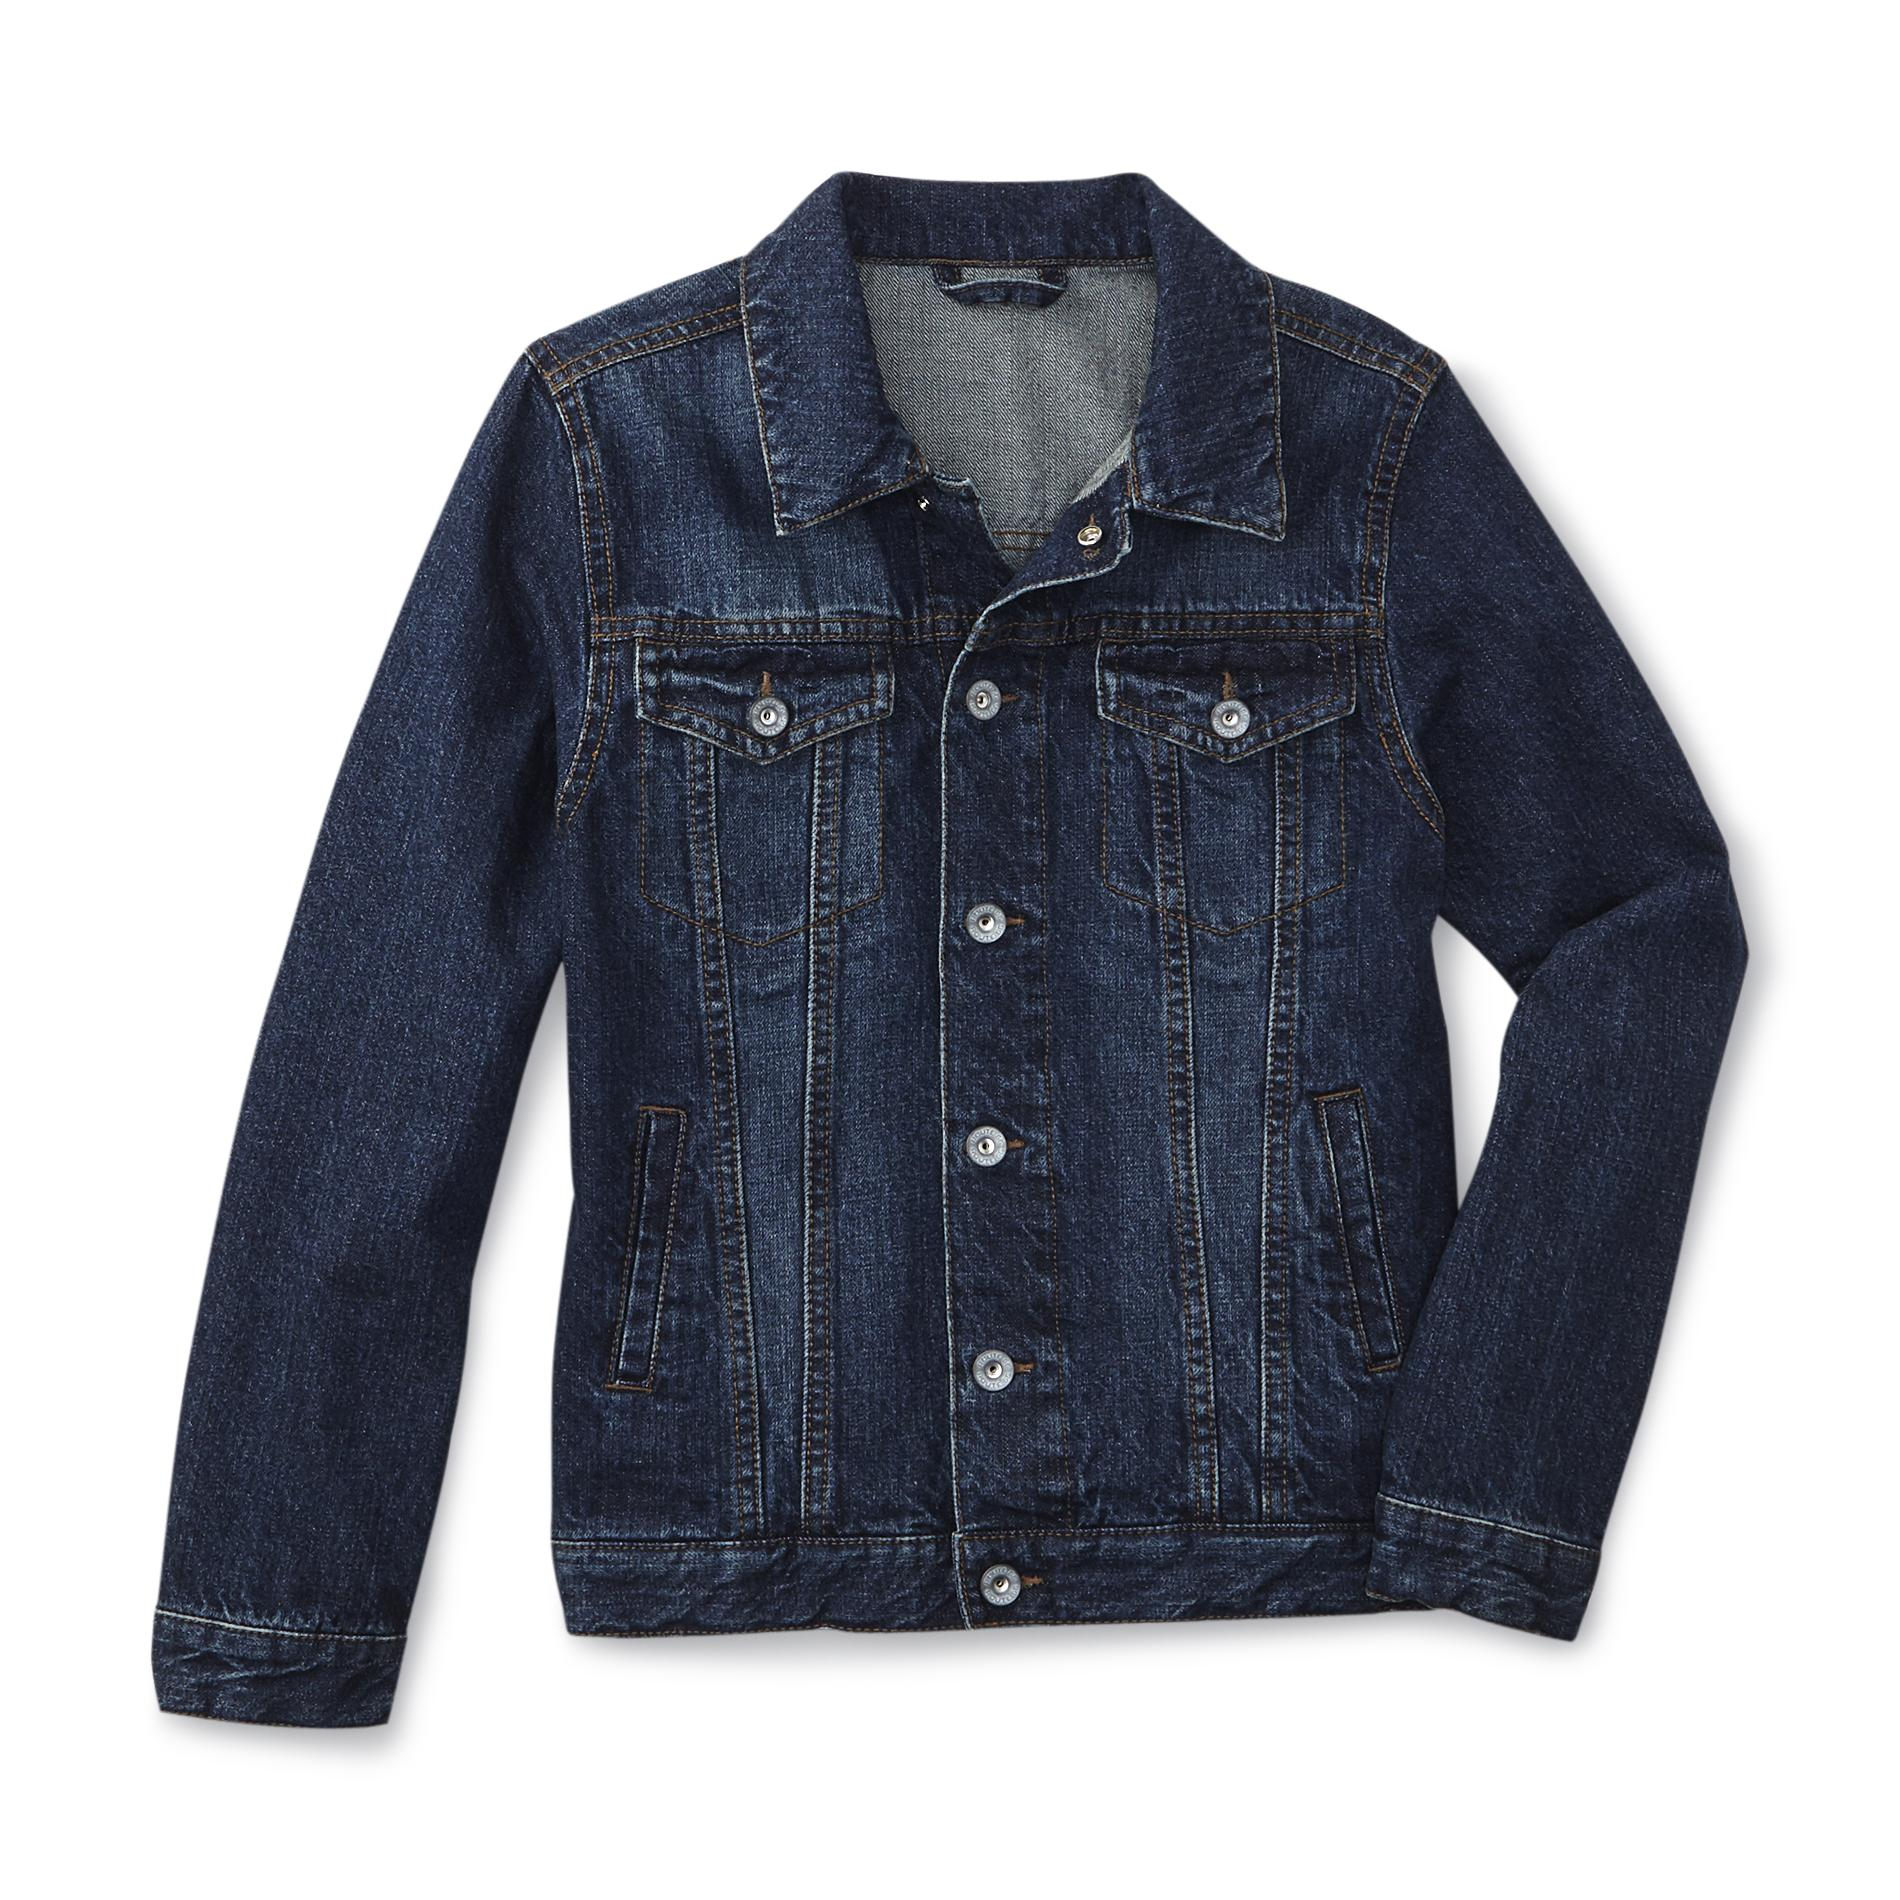 Route 66 Girl's Denim Jacket